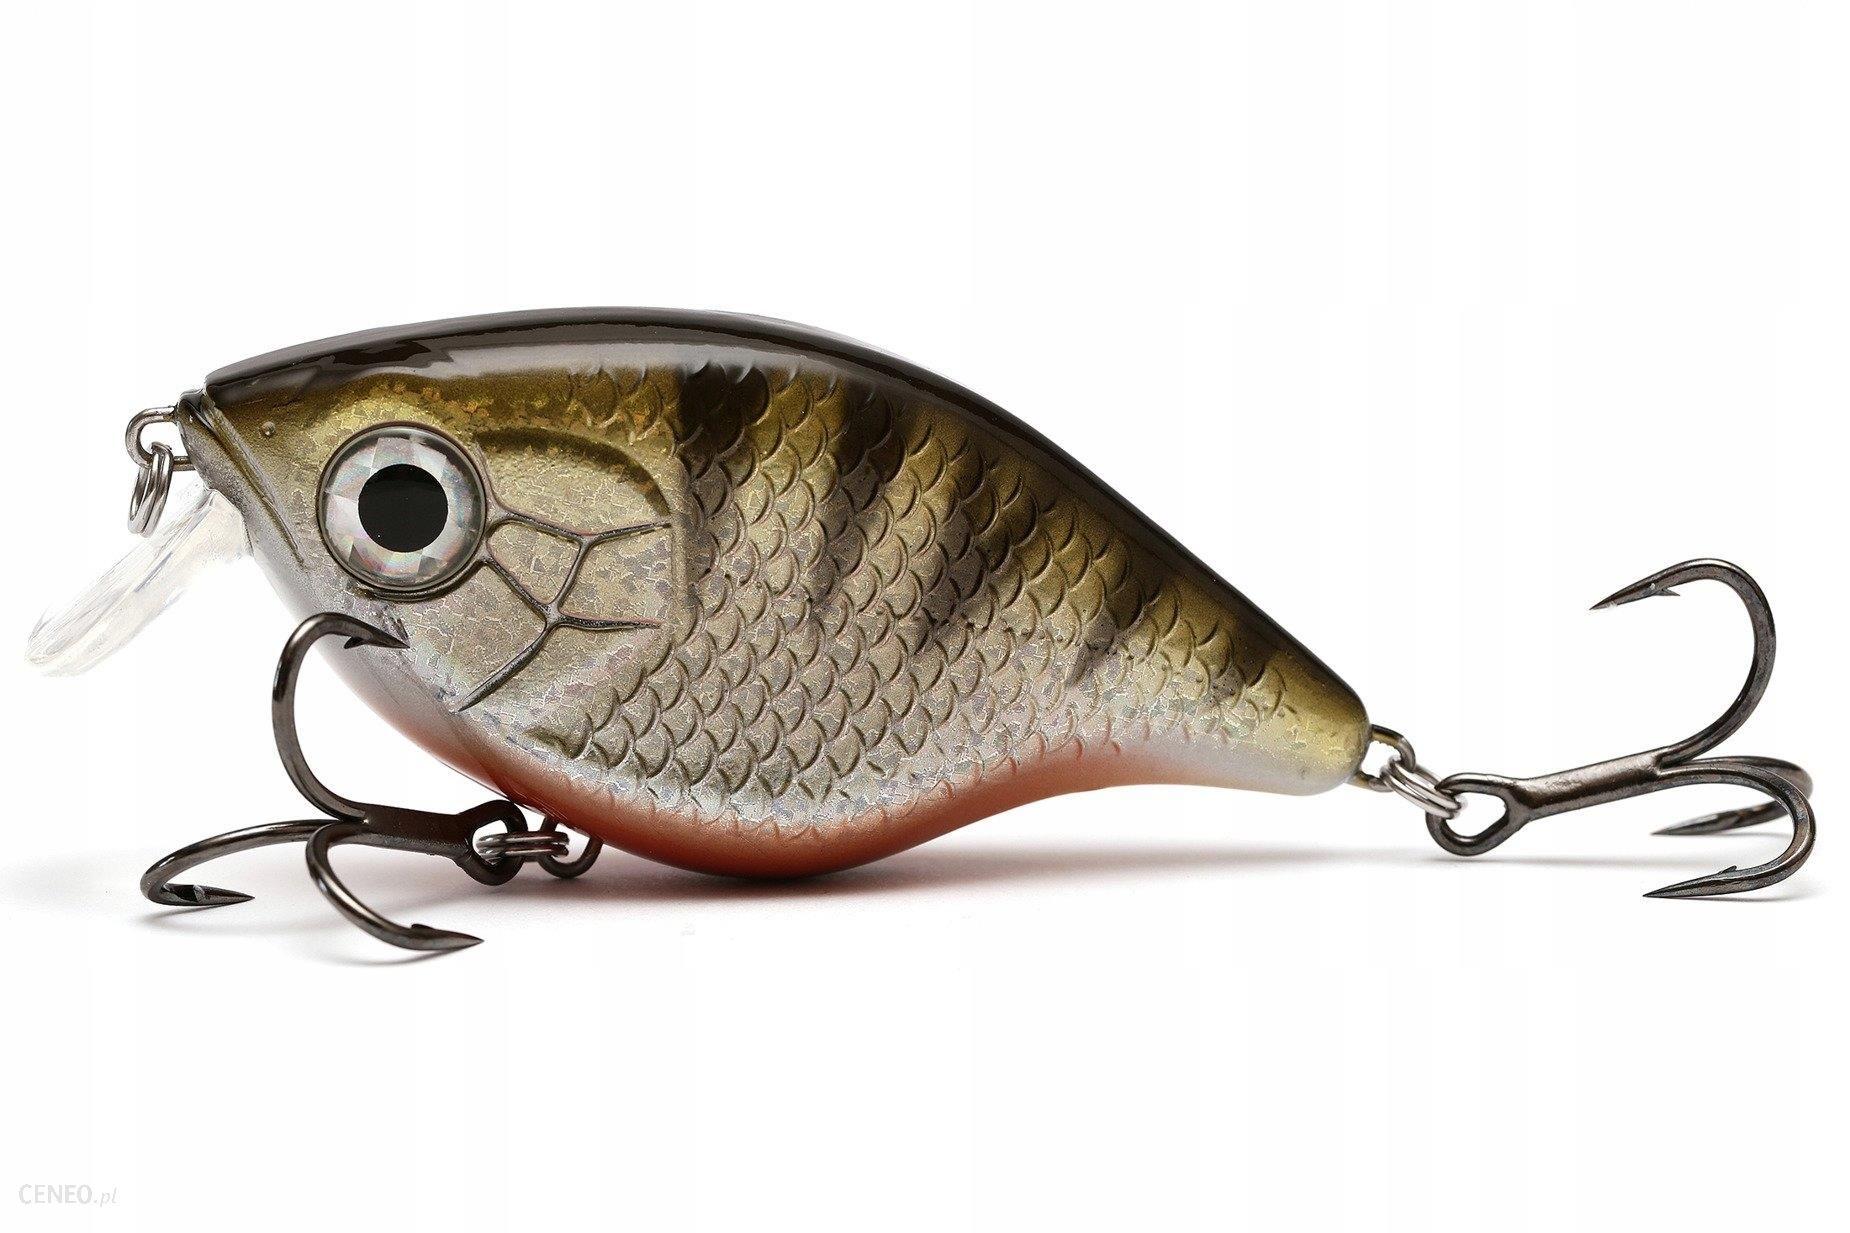 Dam Wobler Madcat Tight-s Shallow Perch 65g Sum